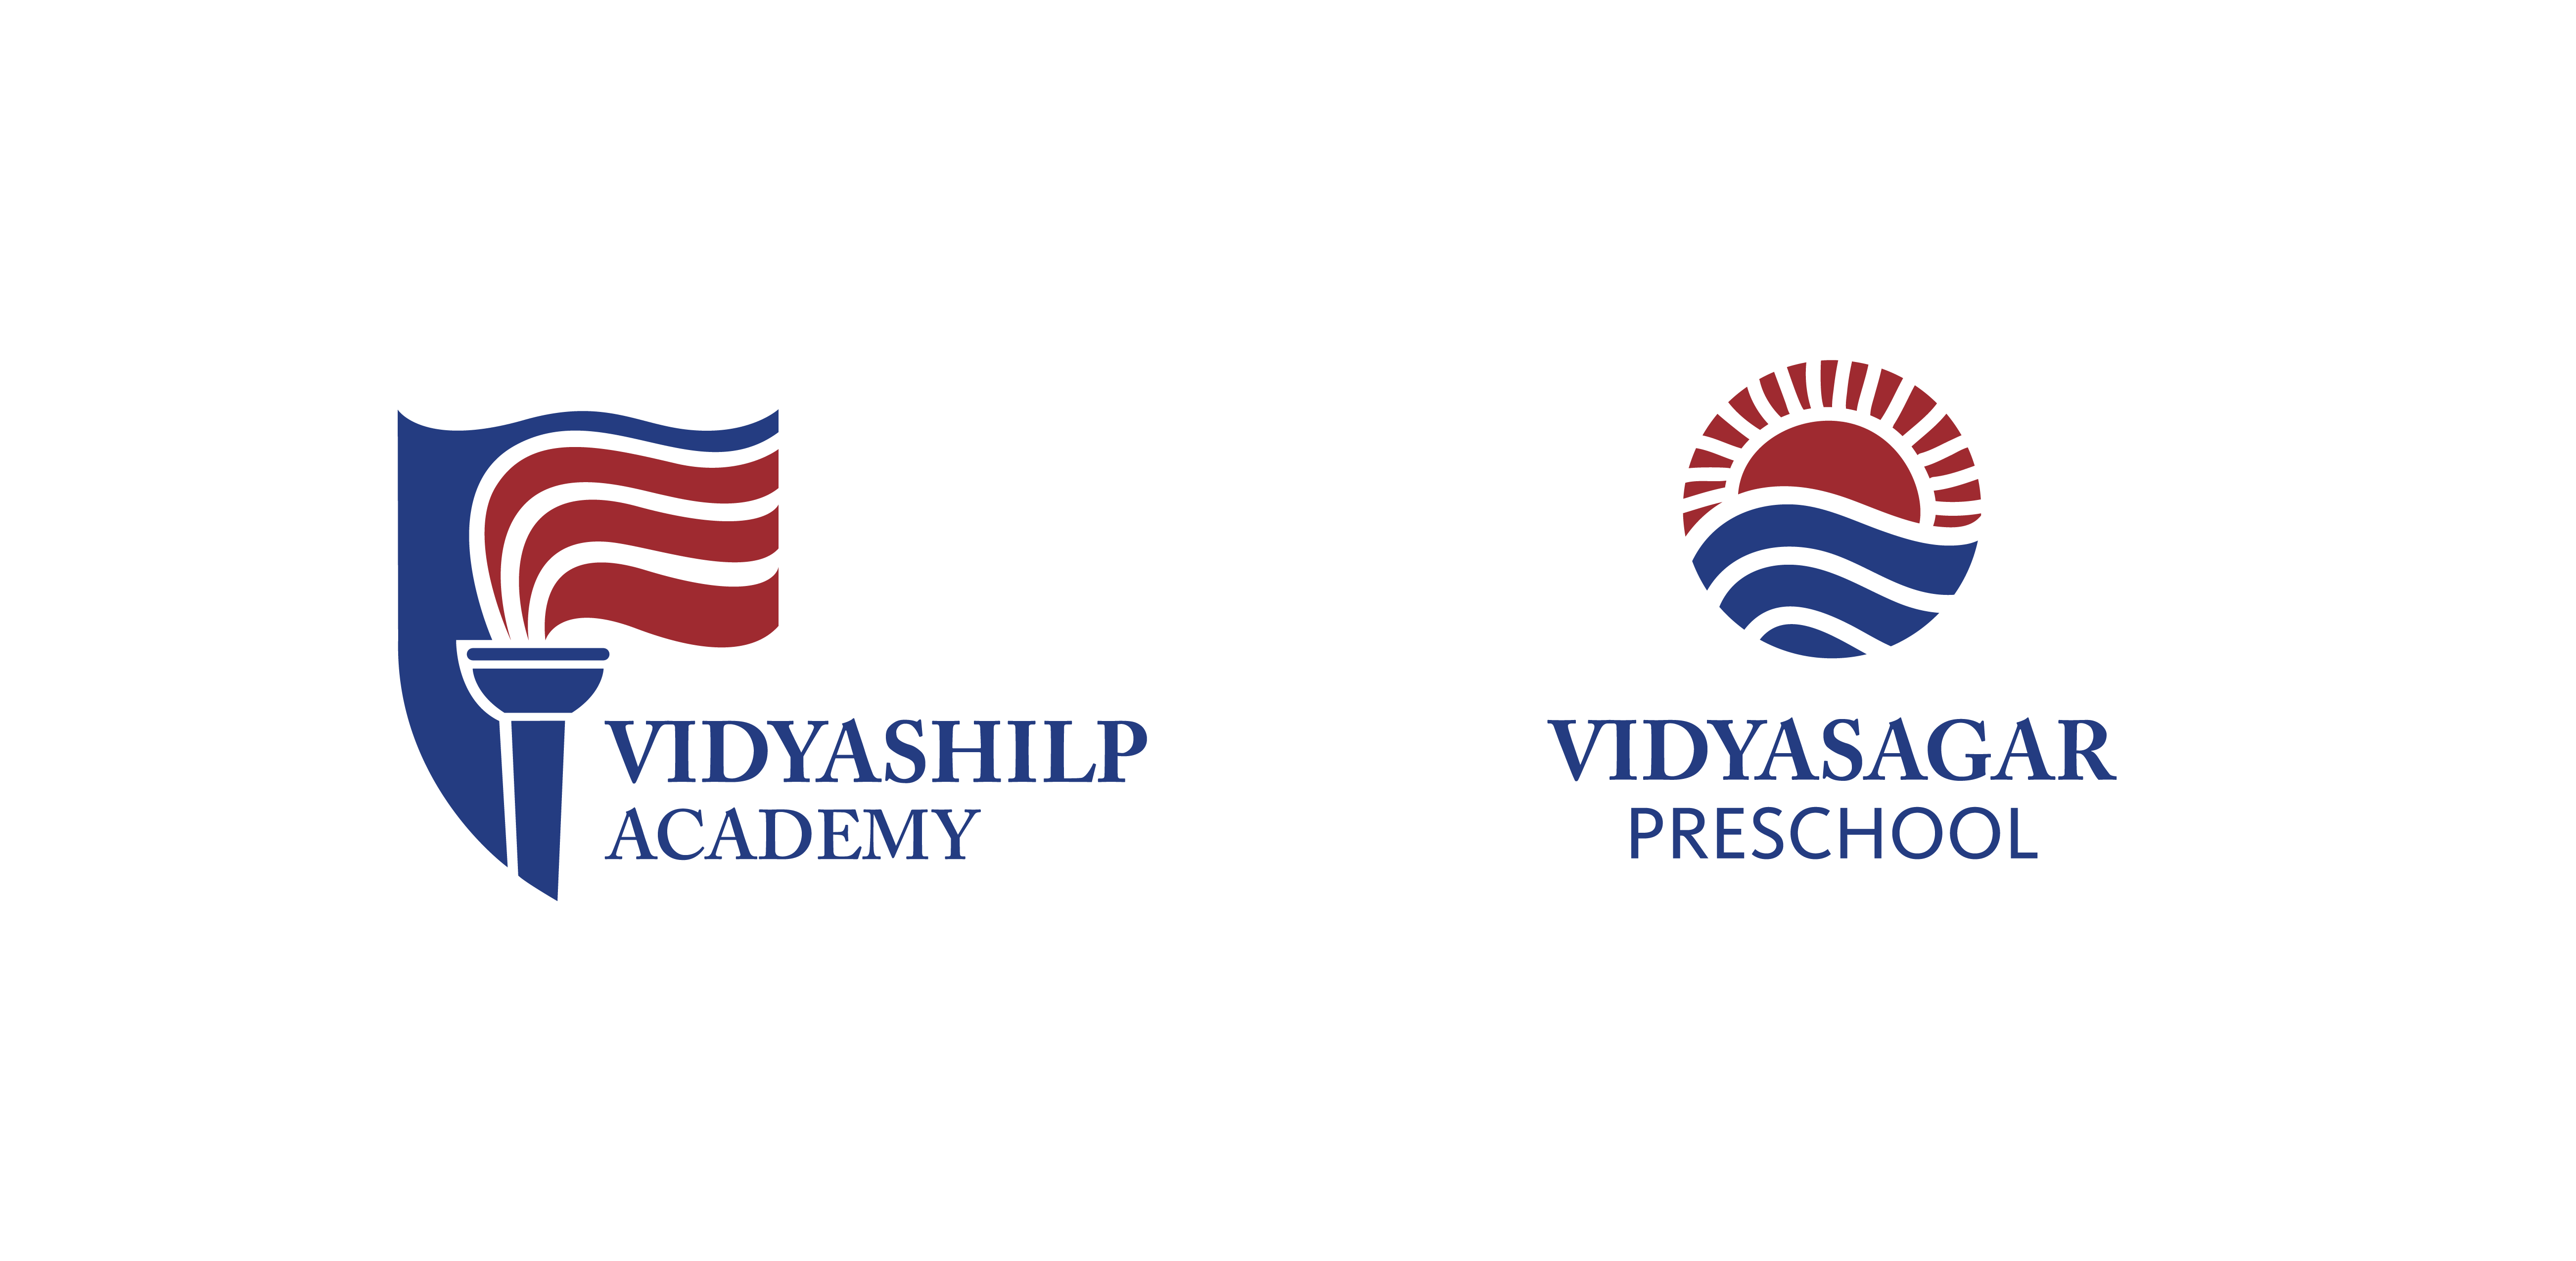 vidyashilp-academy-2-02